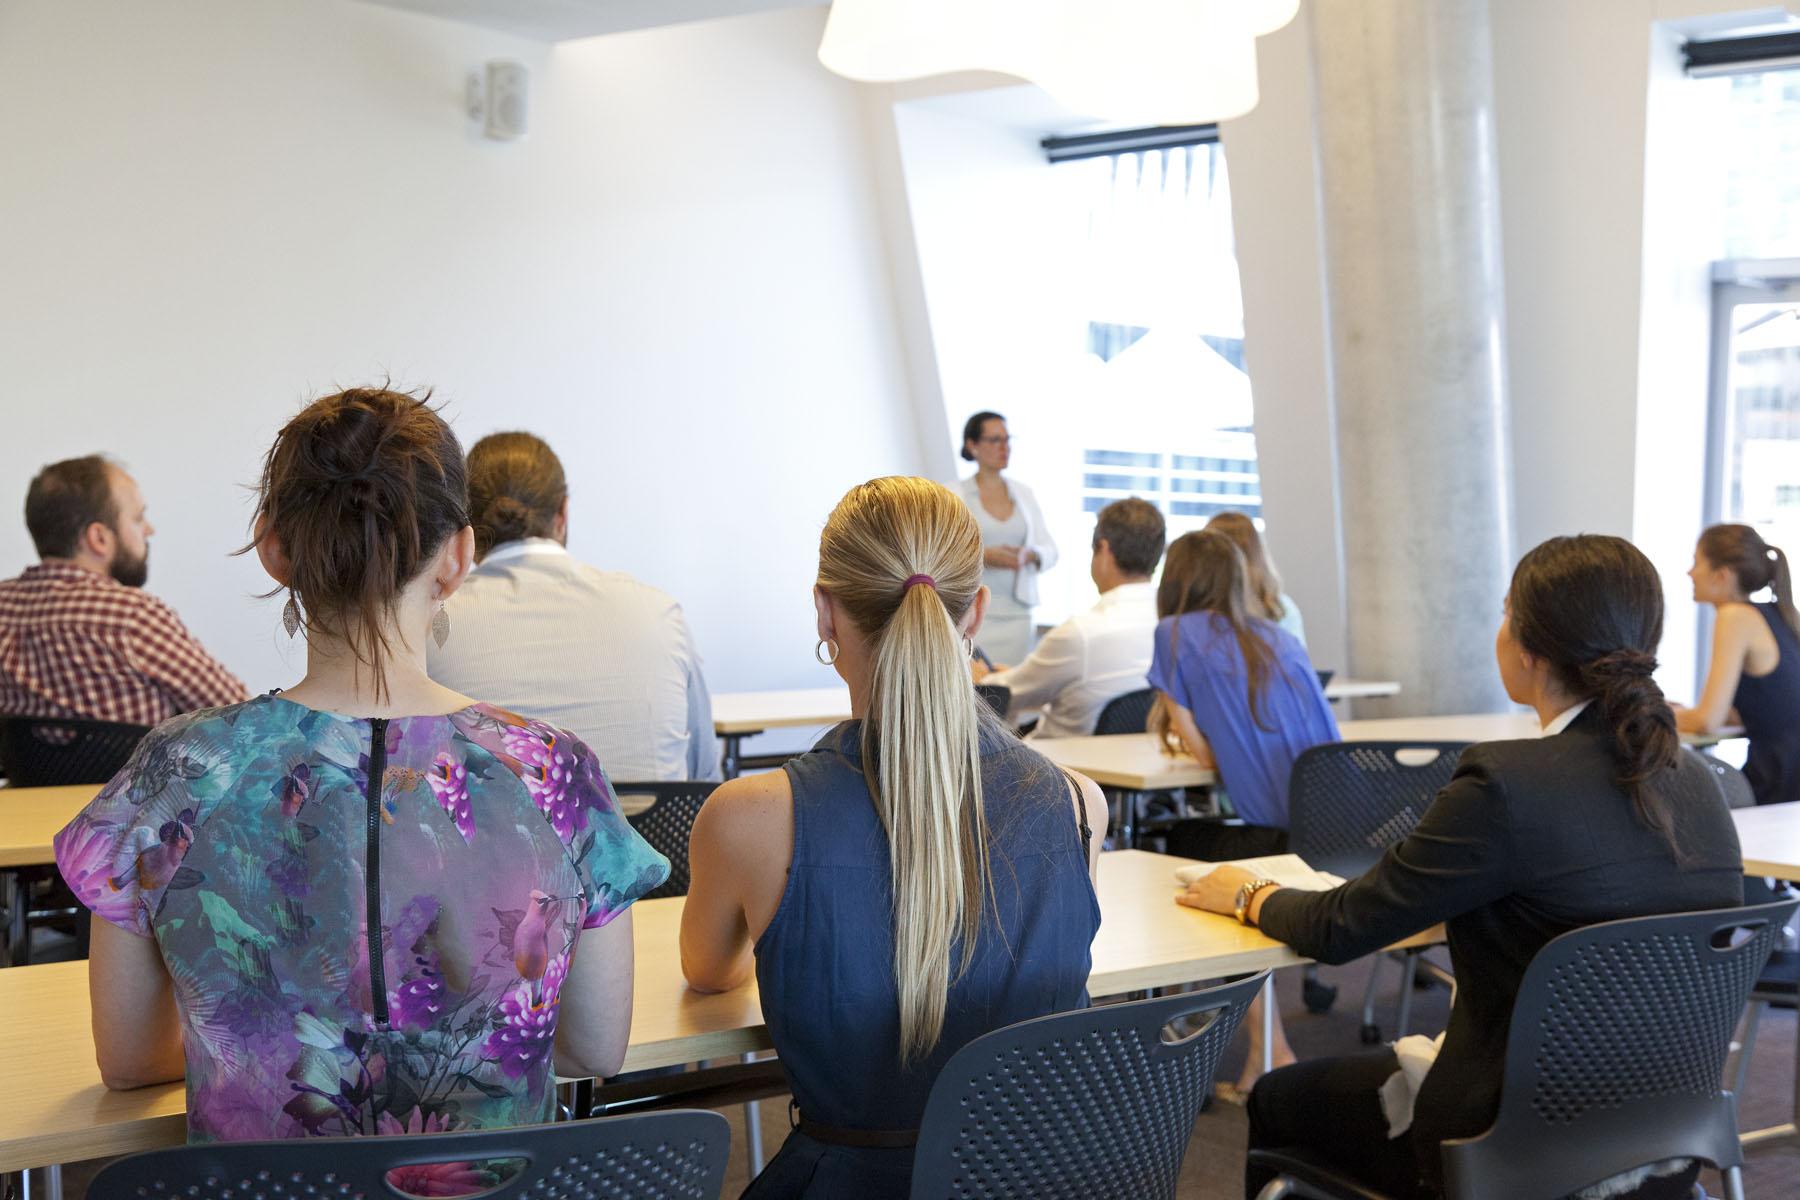 Executive Education Seminar Room - Level 8